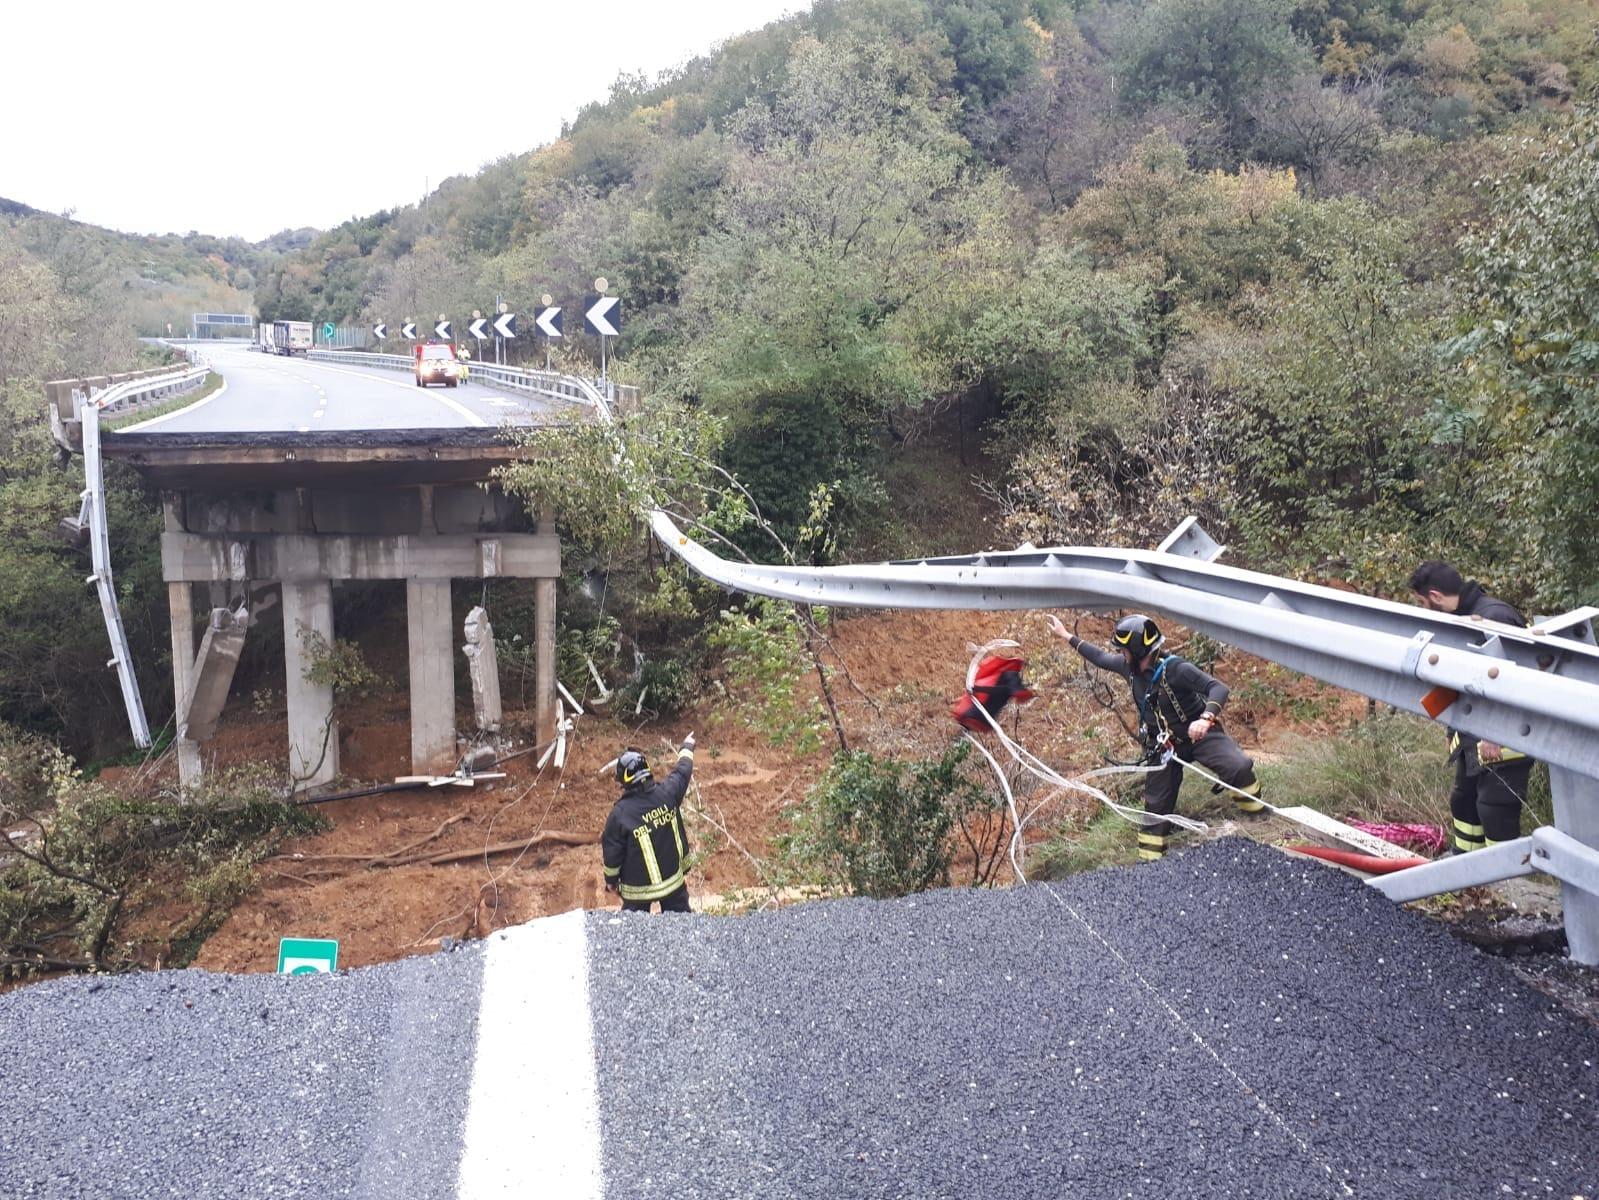 viadotto crollato autostrada a6 torino savona